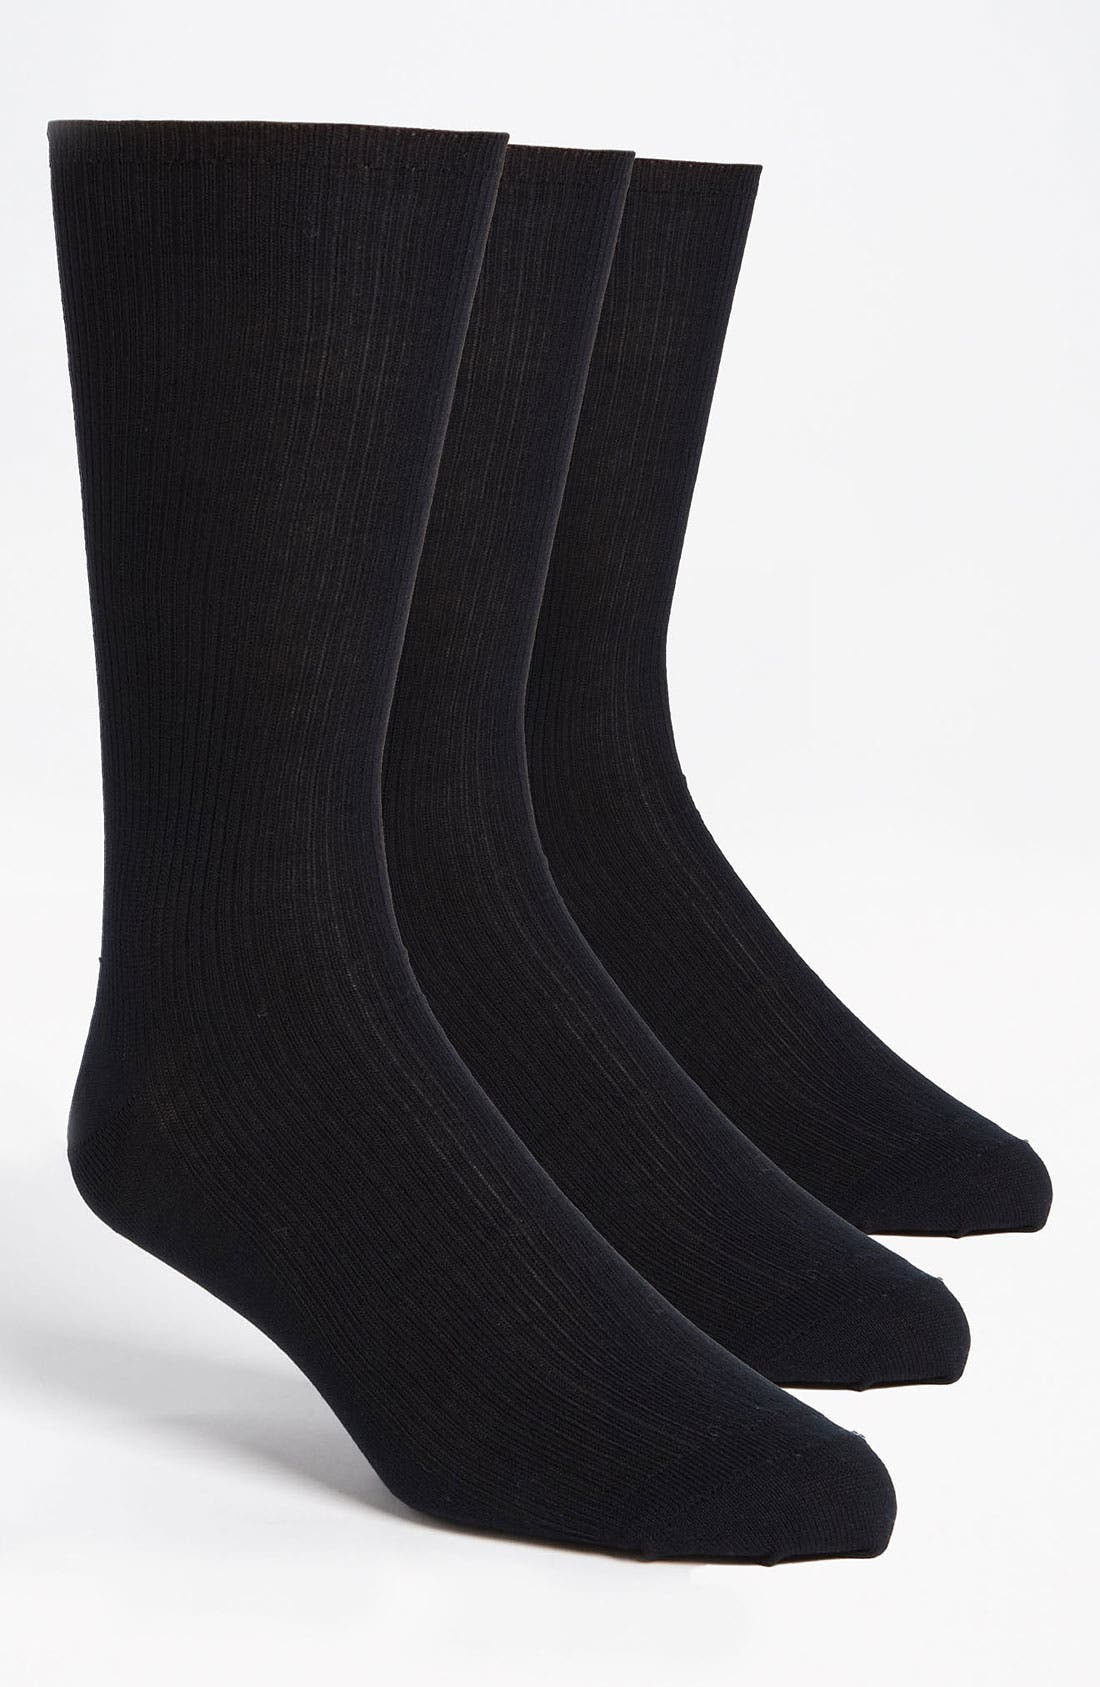 Main Image - Calvin Klein Cotton Blend Dress Socks (3-Pack)